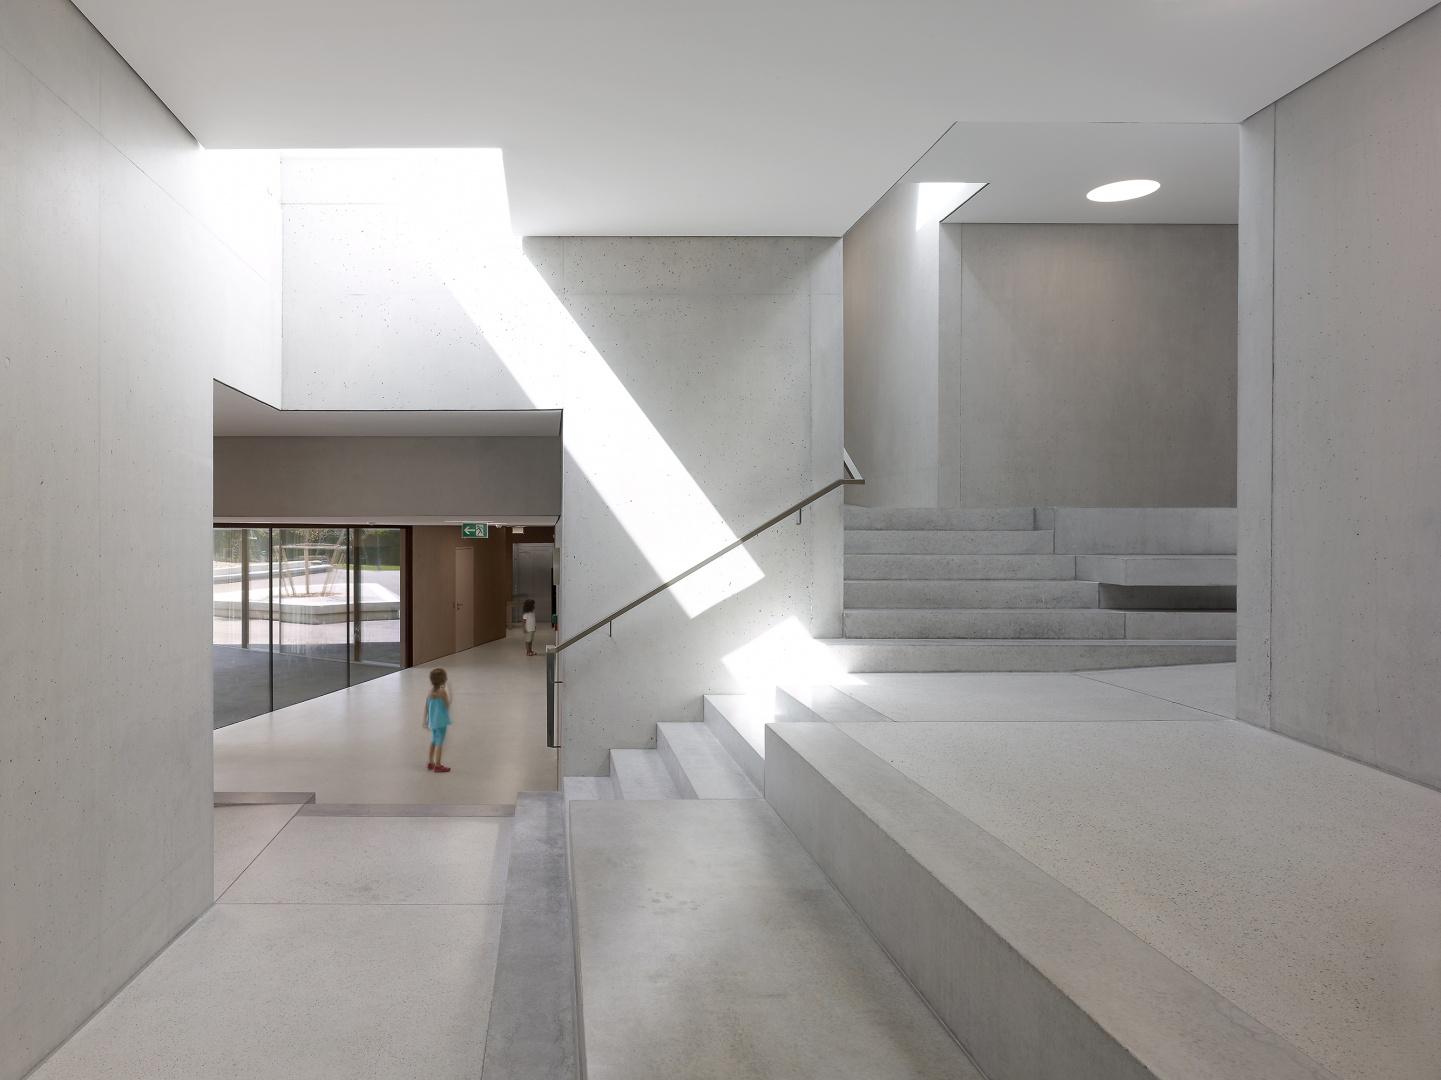 Zentrale Treppe  © Thomas Jantscher